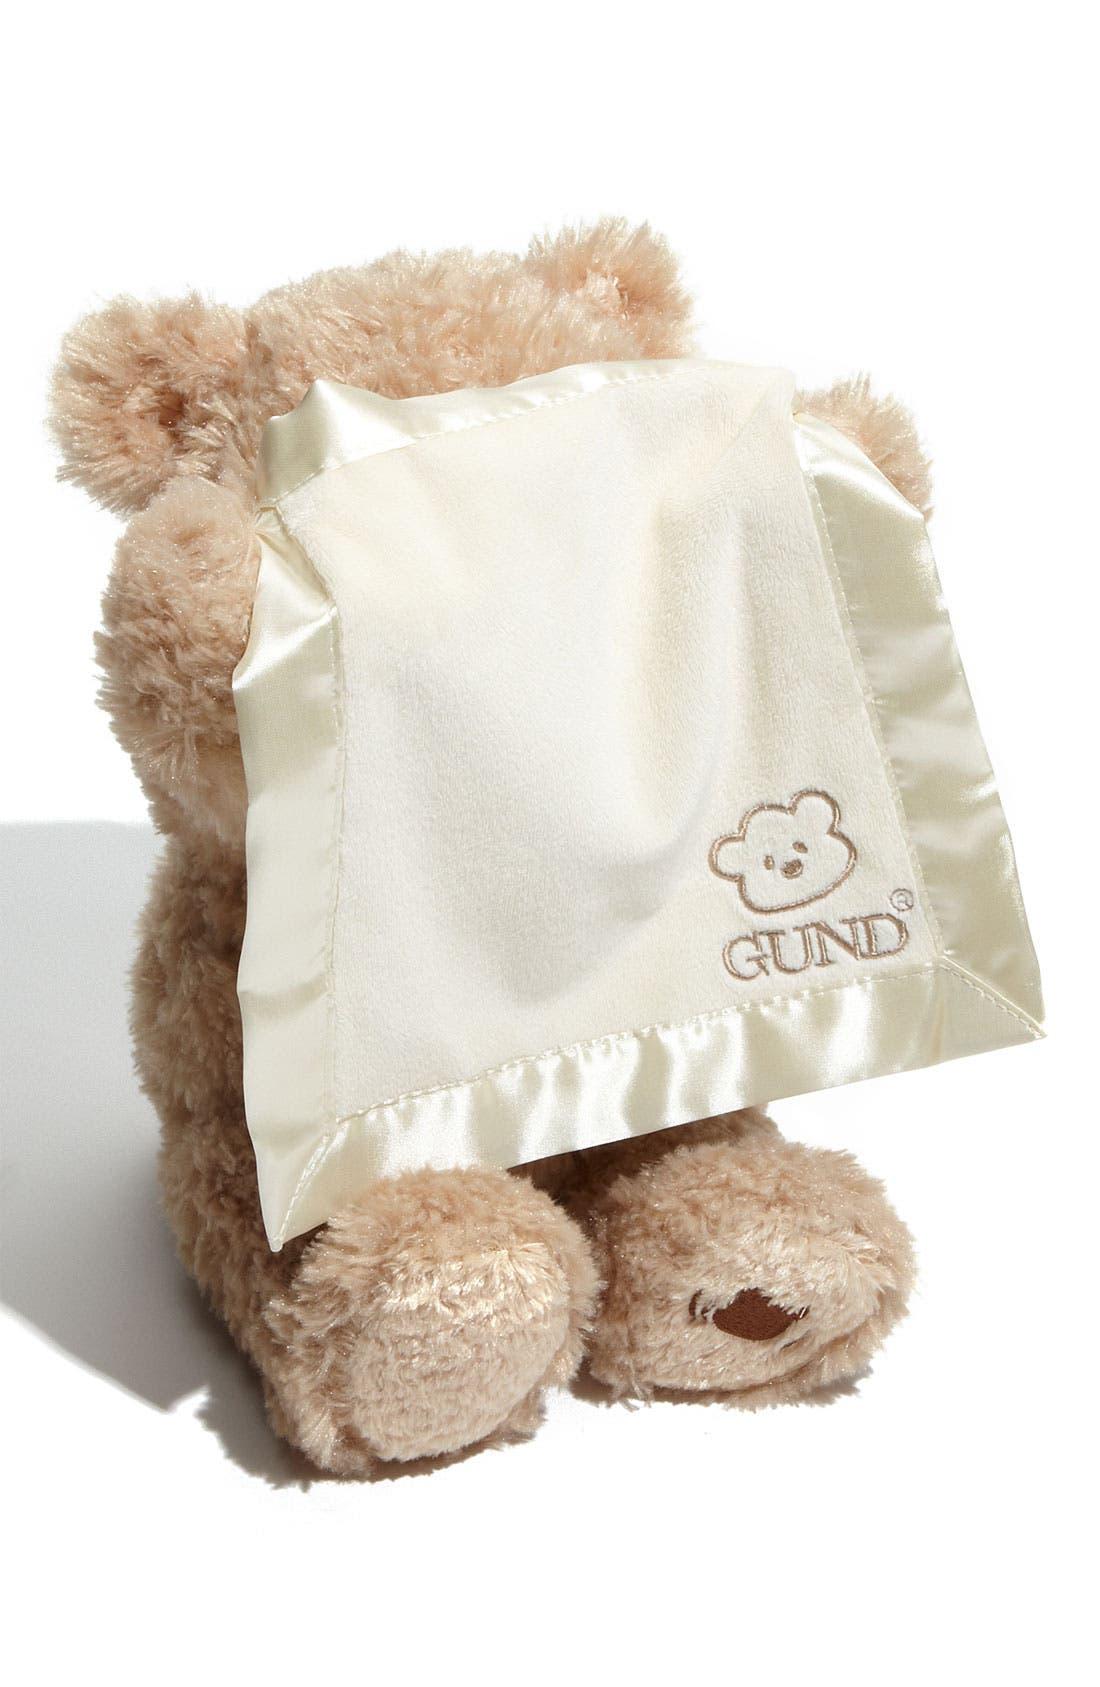 Baby Gund 'Peekaboo' Bear,                             Alternate thumbnail 2, color,                             No Color